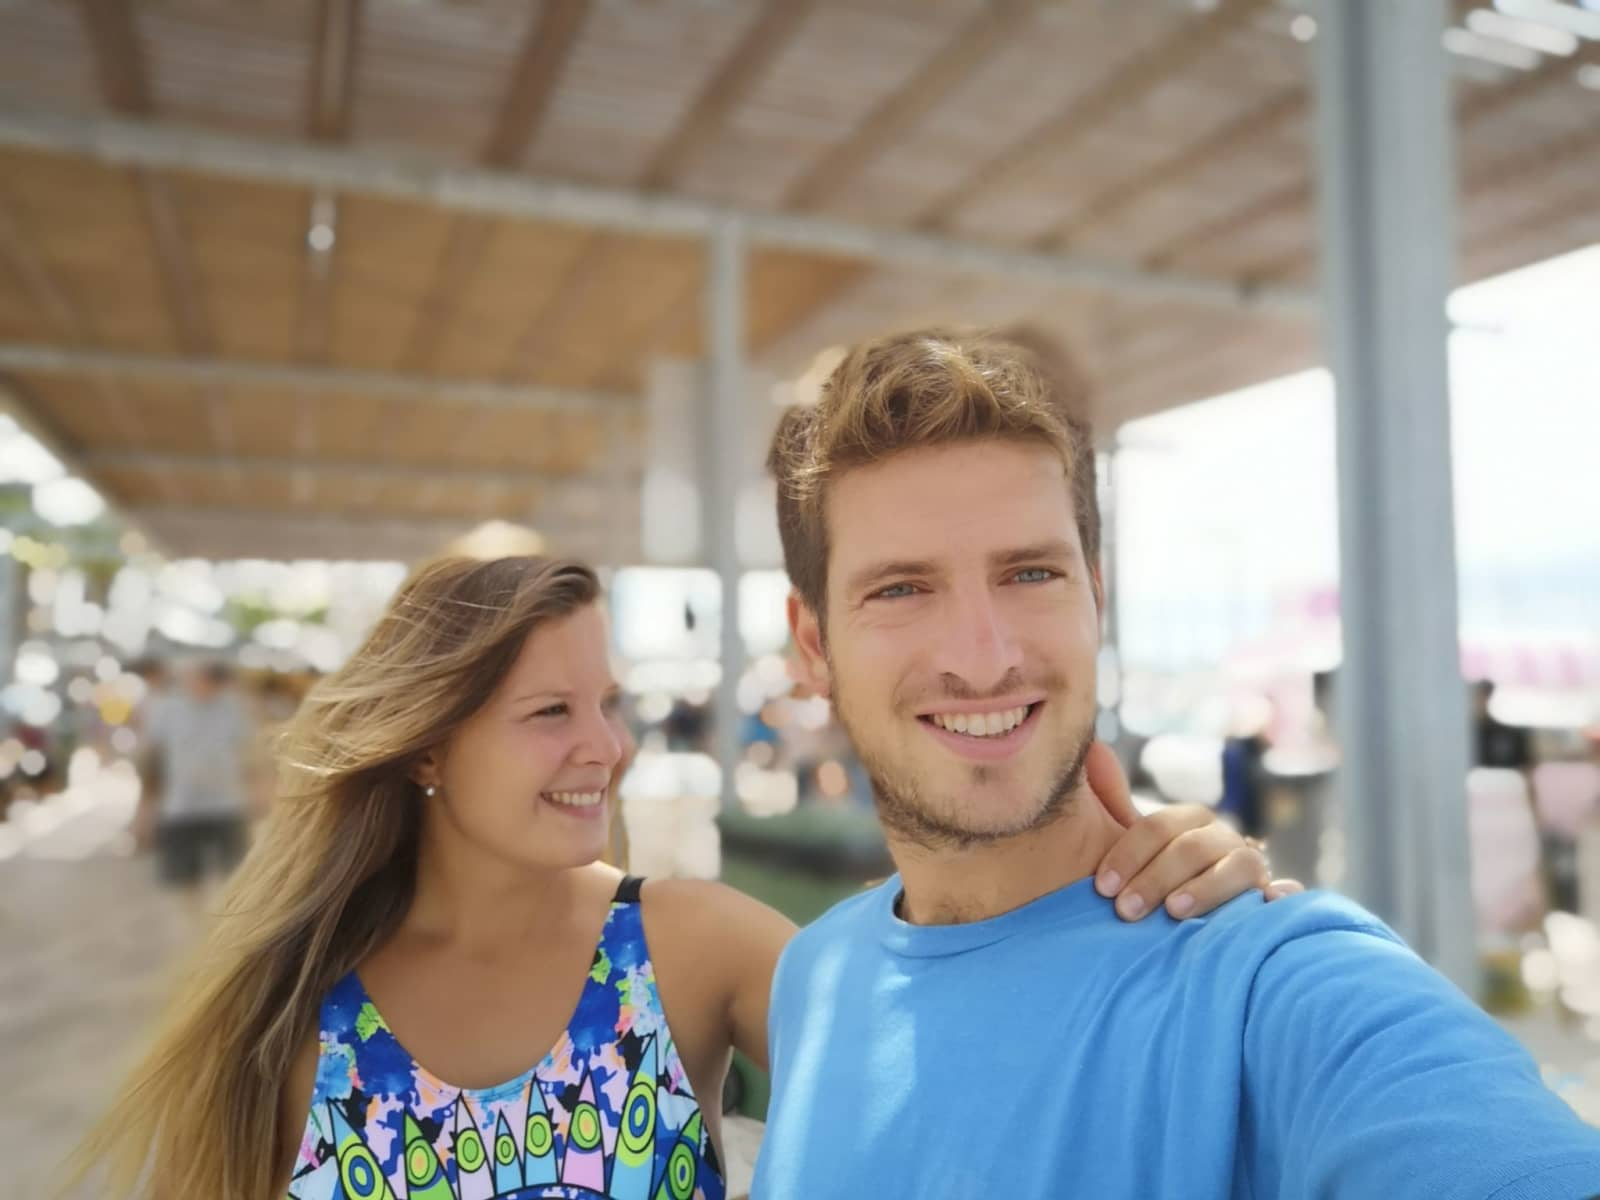 Meli & Hernan ricardo from Palma, Spain